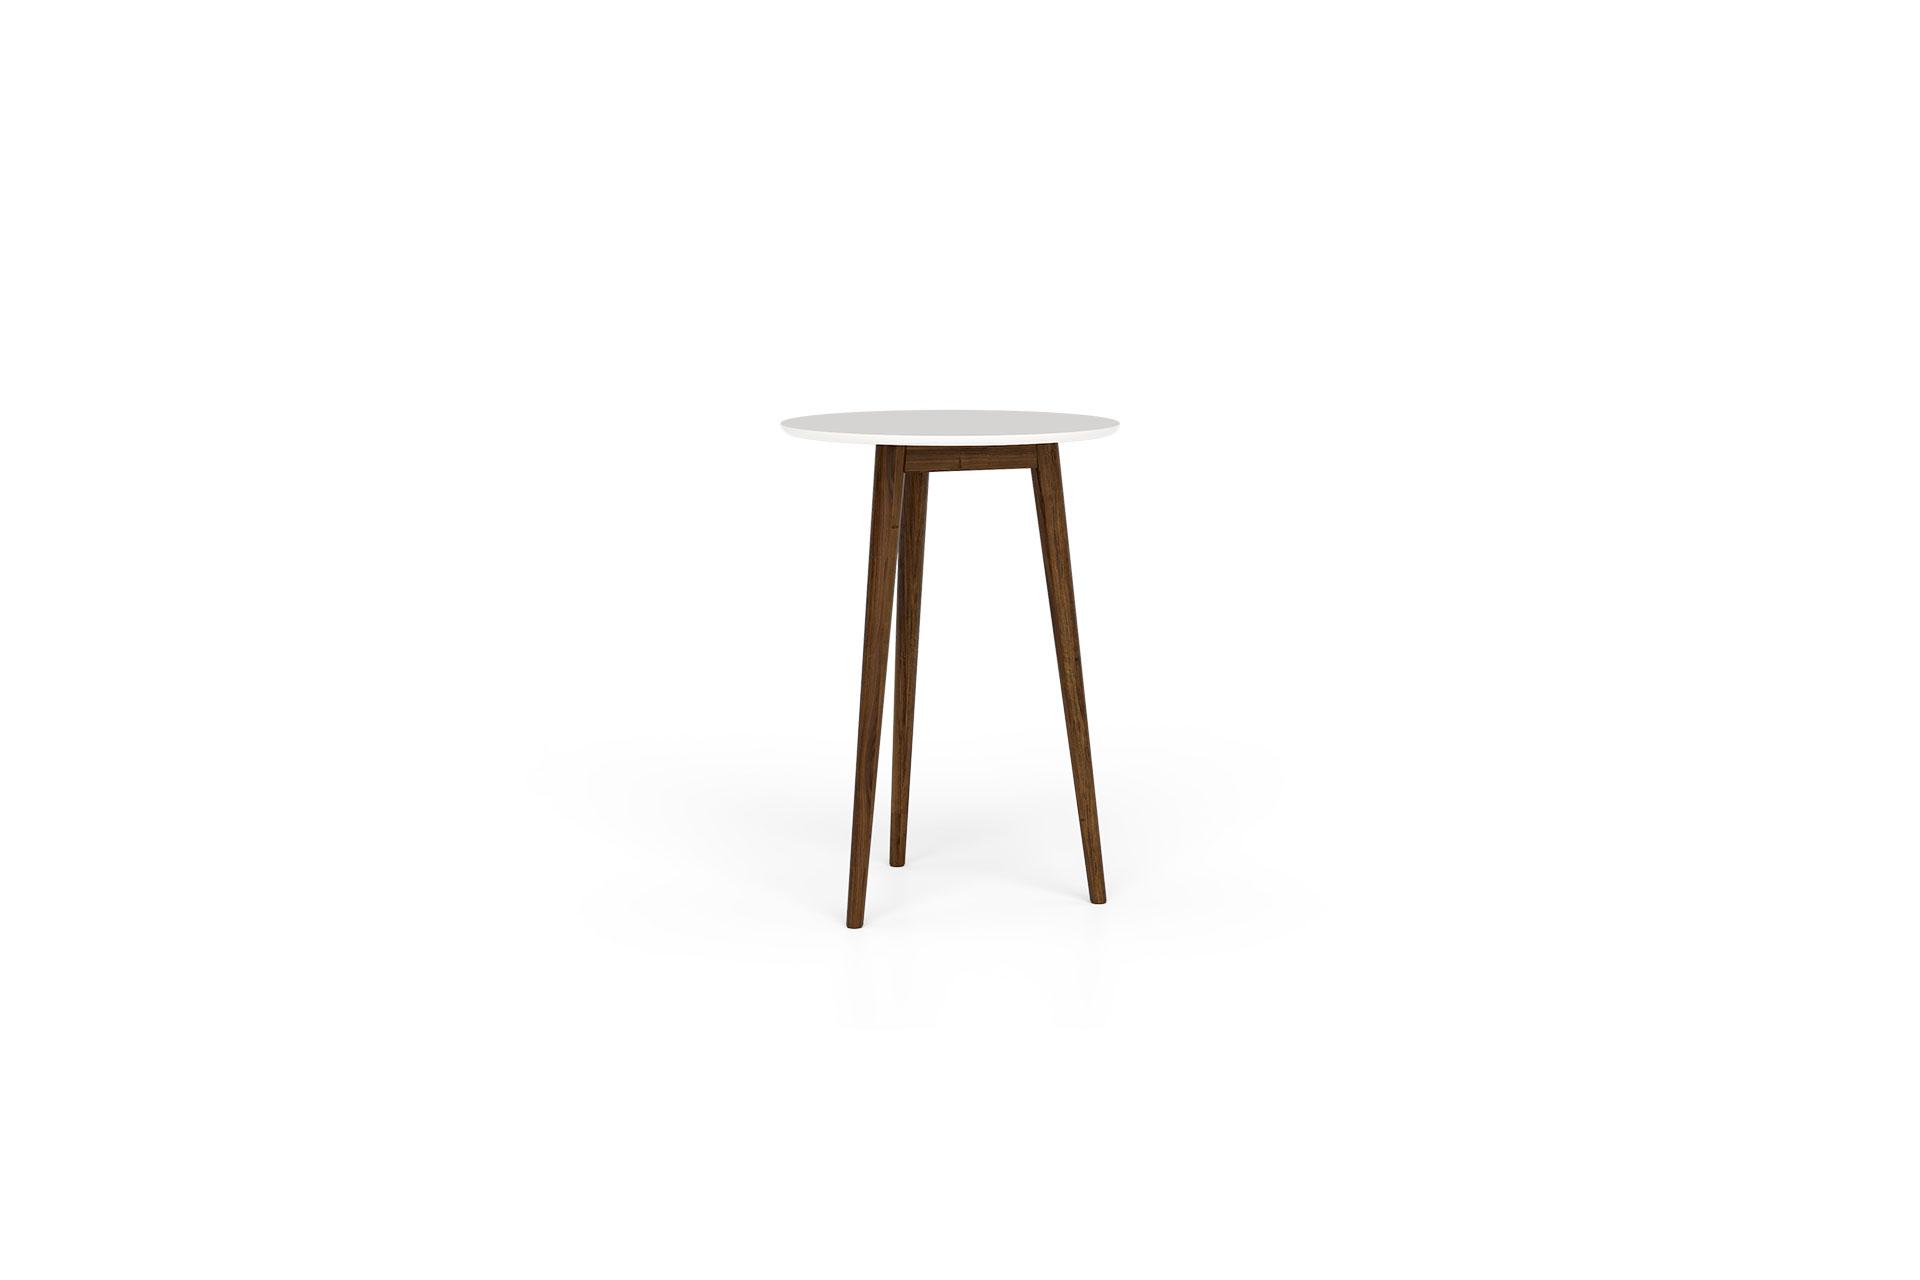 loft-and-manor-go-tables-round-walnut-16-1-1920×1280